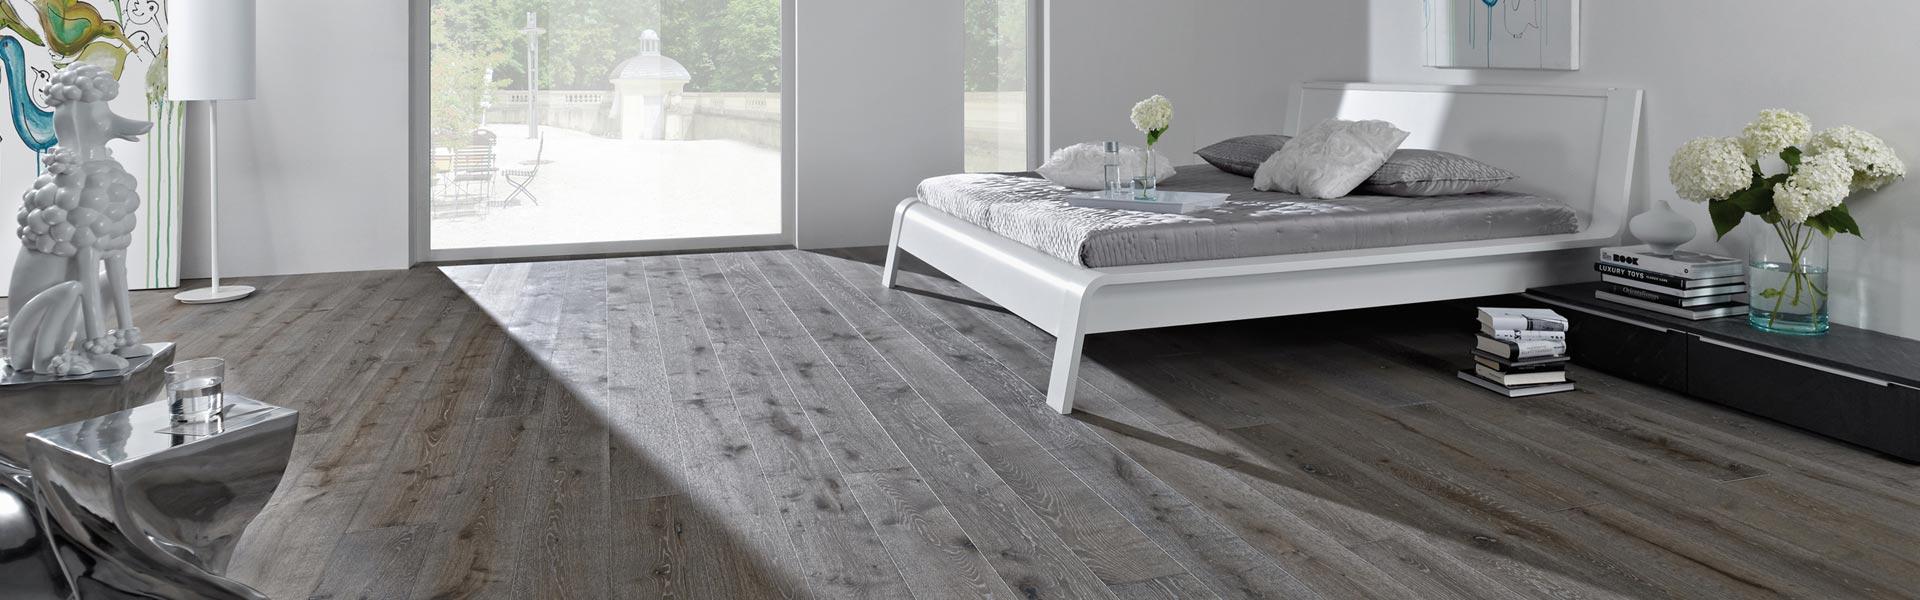 ea ceramic fliesen naturscheine granit parkett laminat innsbruck. Black Bedroom Furniture Sets. Home Design Ideas